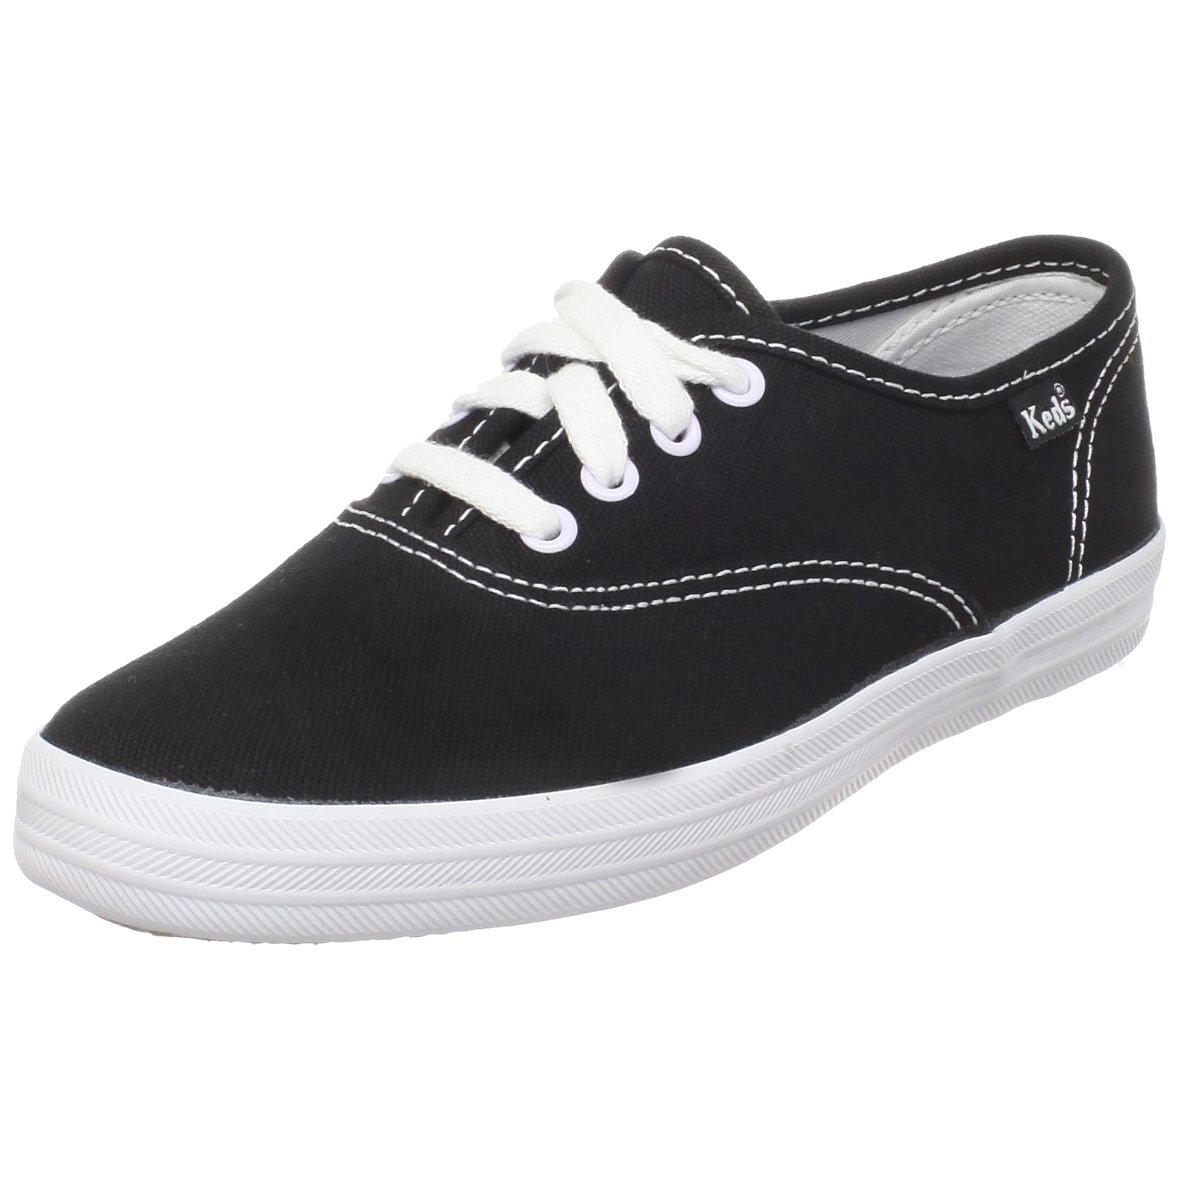 d52d7ea4e3d Keds Girls KY30060 Sneaker  Amazon.ca  Shoes   Handbags